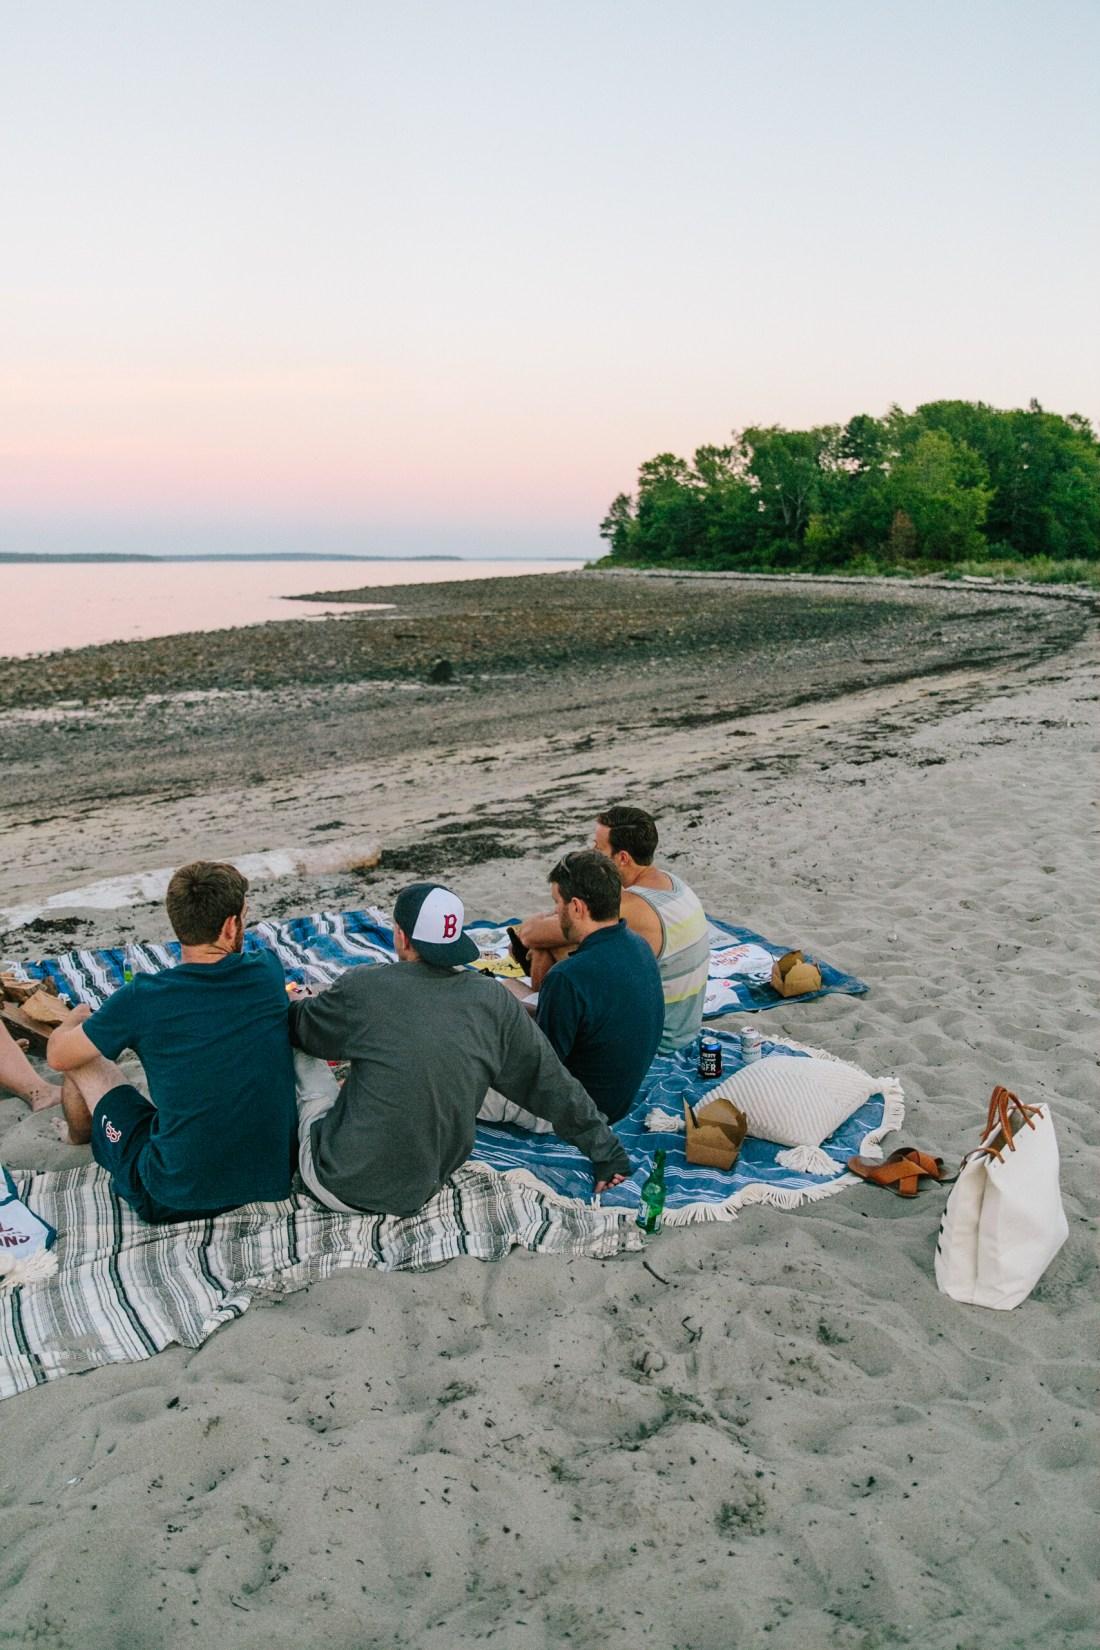 How To Host An Intimate Beach Picnic | Beach Dinner | Beach Fire | Intimate Beach Side Evening | Camden, Maine | Things to do in Camden, Maine | Gorgeous Styled Beach Picnic | ESCAPE ForestBound Bag | Round Beach Towel | Fun Beach Fire With Friends | Beach Adventure via @elanaloo + elanaloo.com